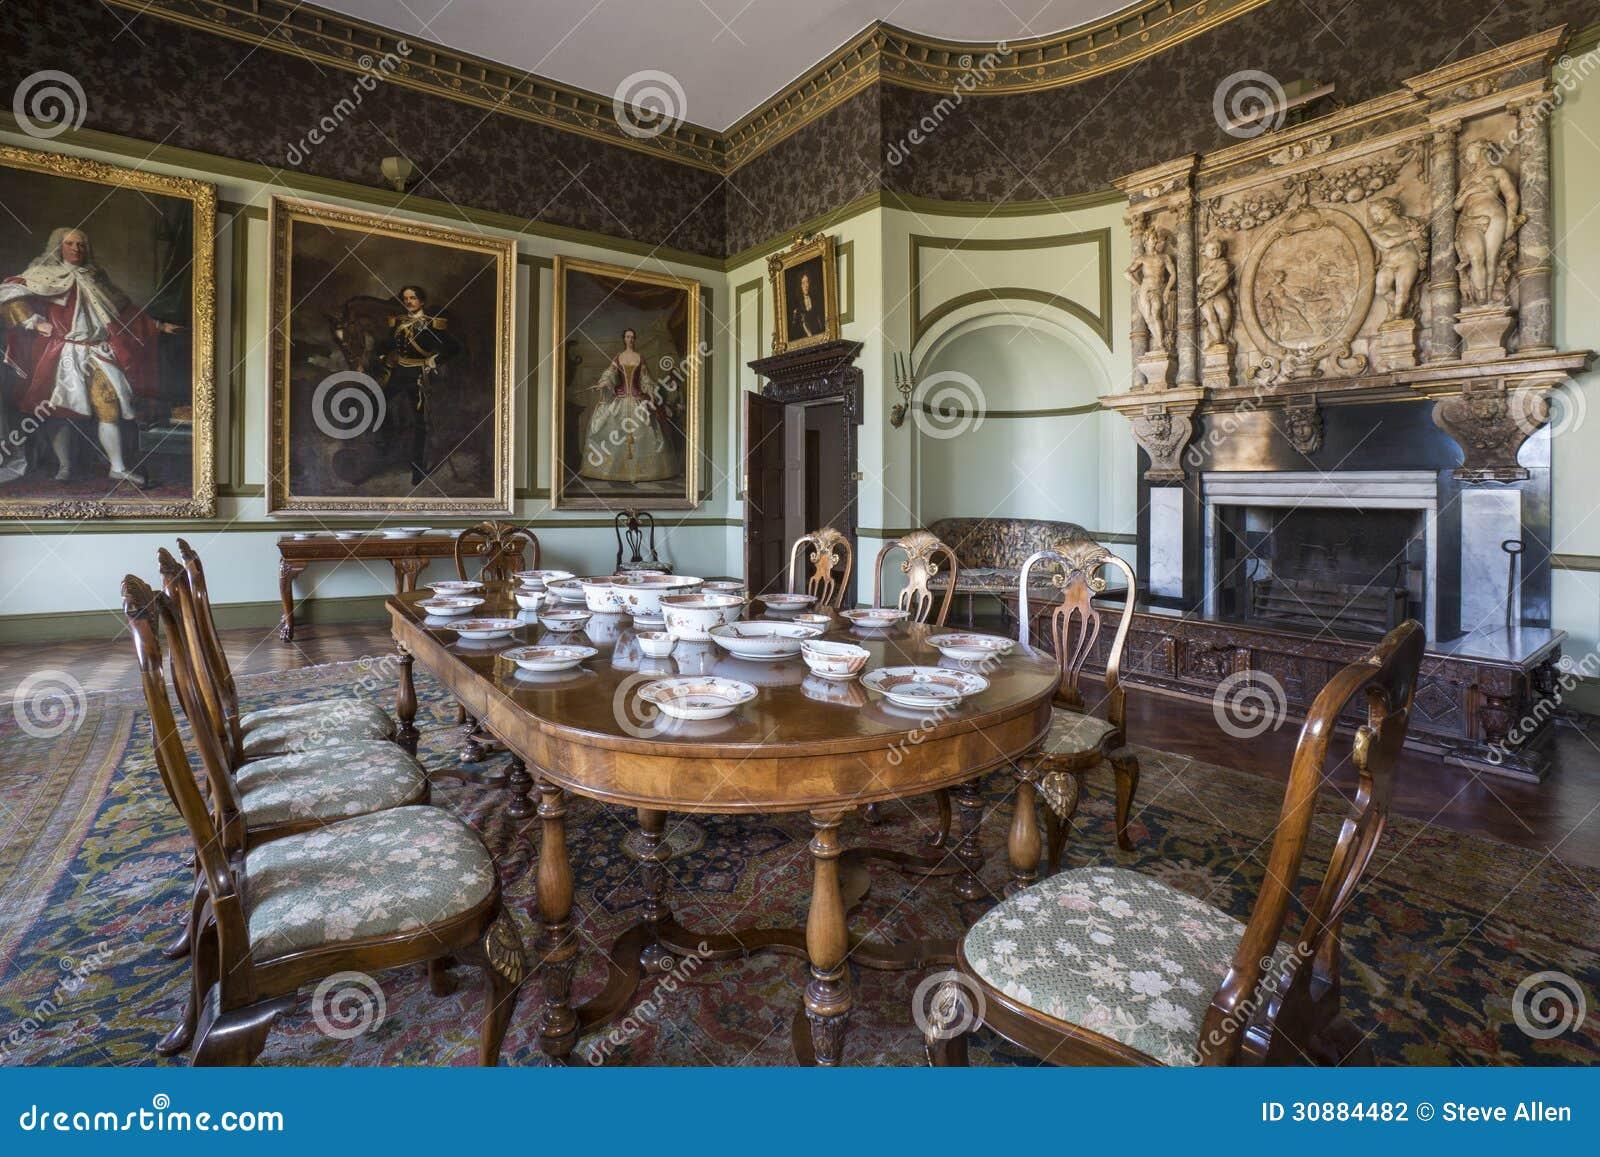 Manor House   Yorkshire   England